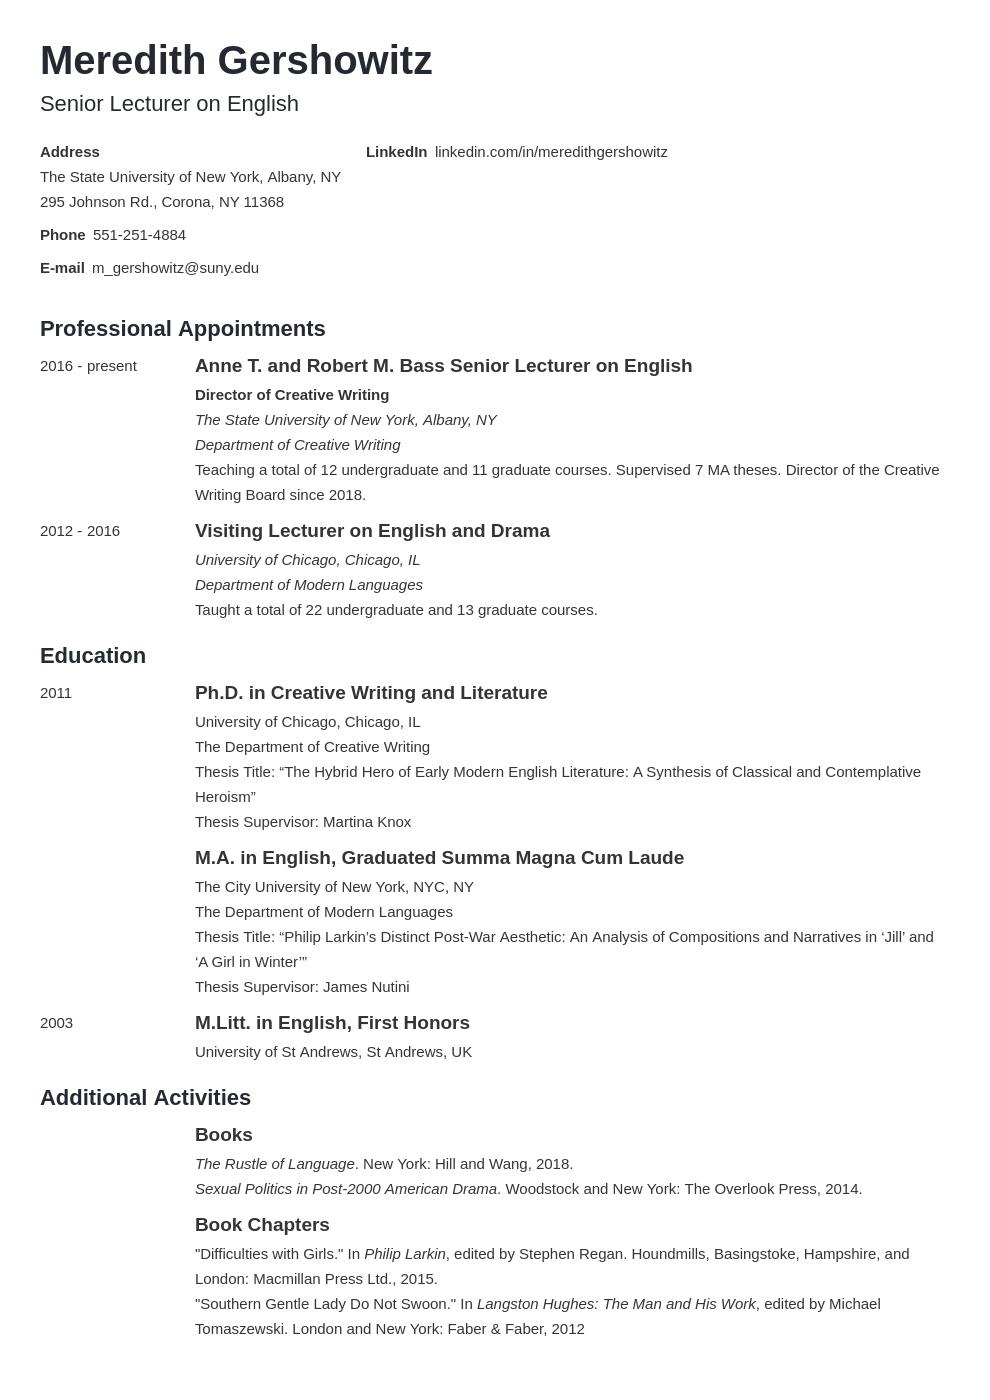 Academic Cv Example Template Minimo Academic Cv Curriculum Vitae Template Curriculum Vitae